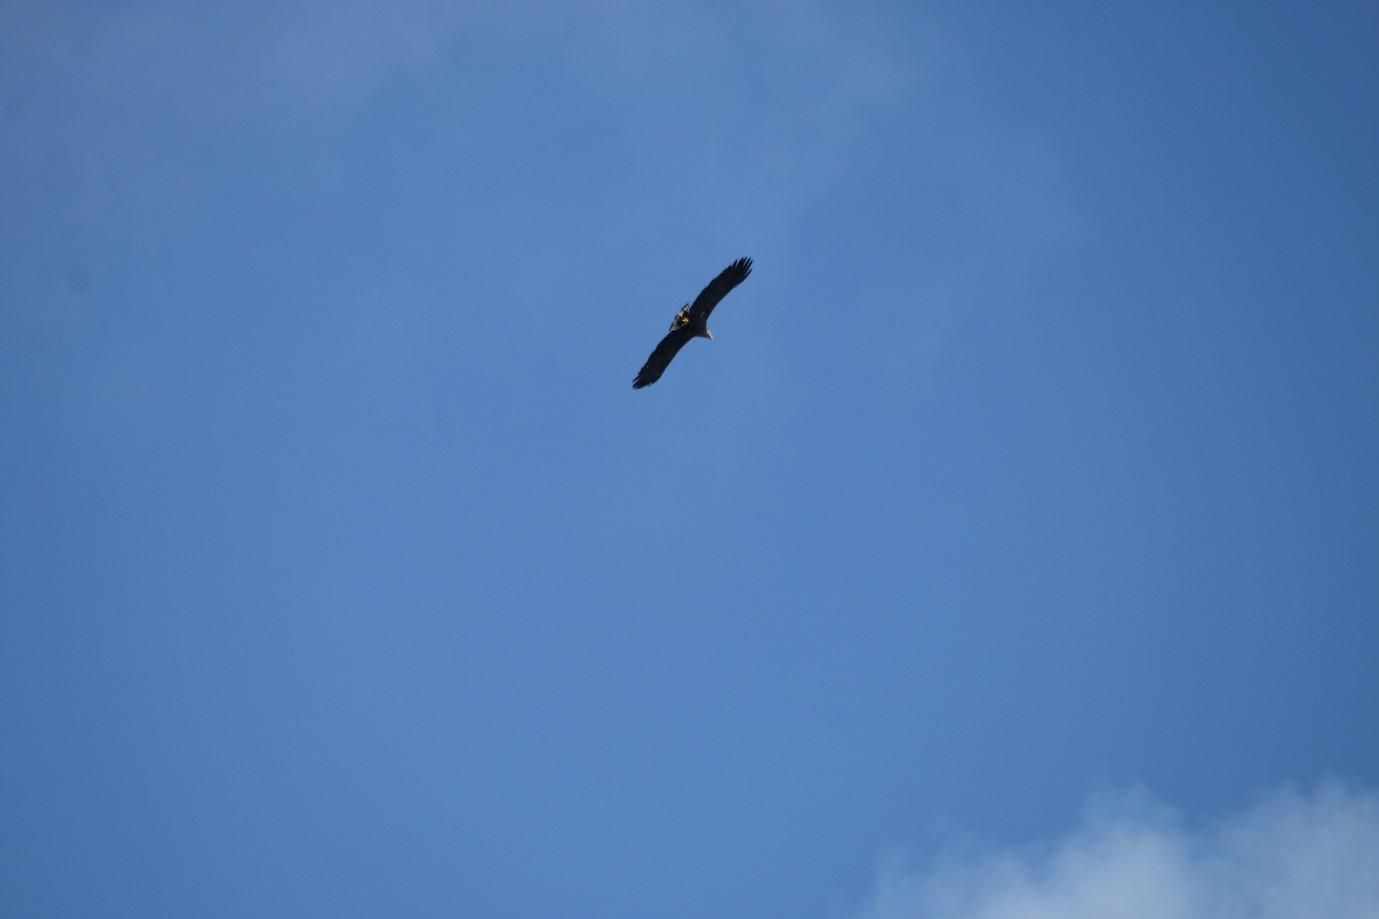 A soaring eagle against the blue sky